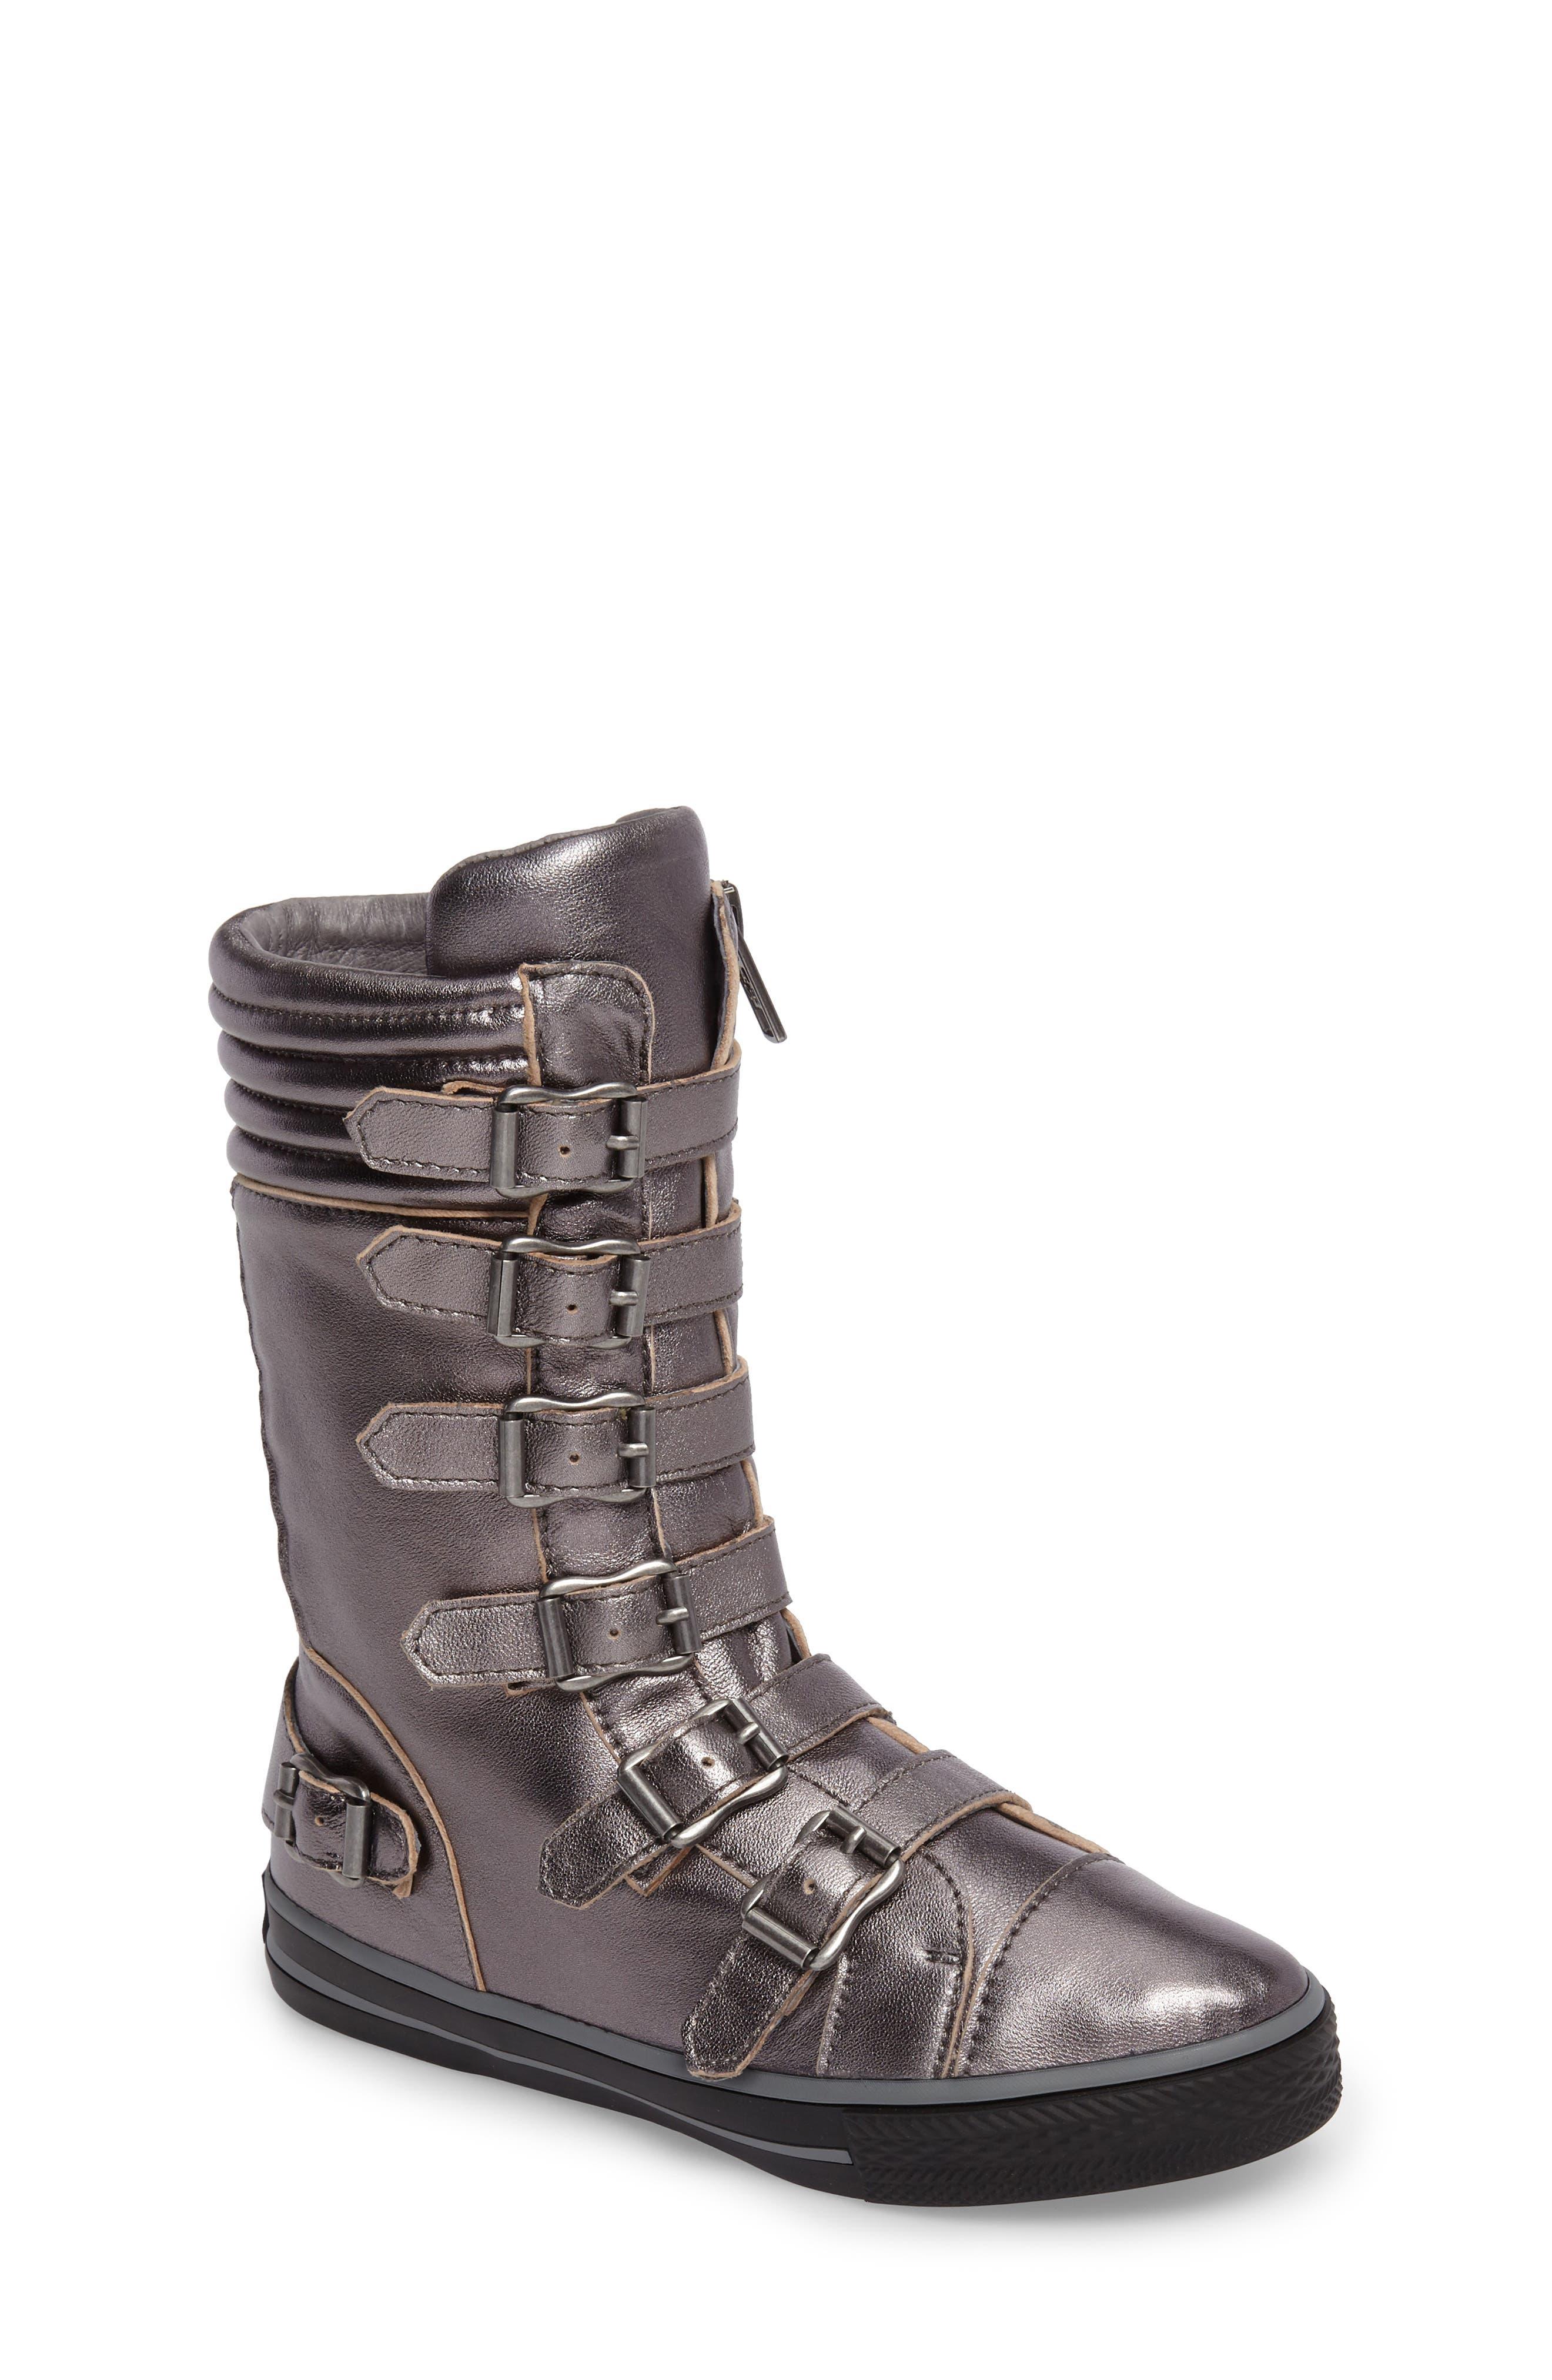 Vava Natalie Tall Sneaker Boot,                             Main thumbnail 1, color,                             040